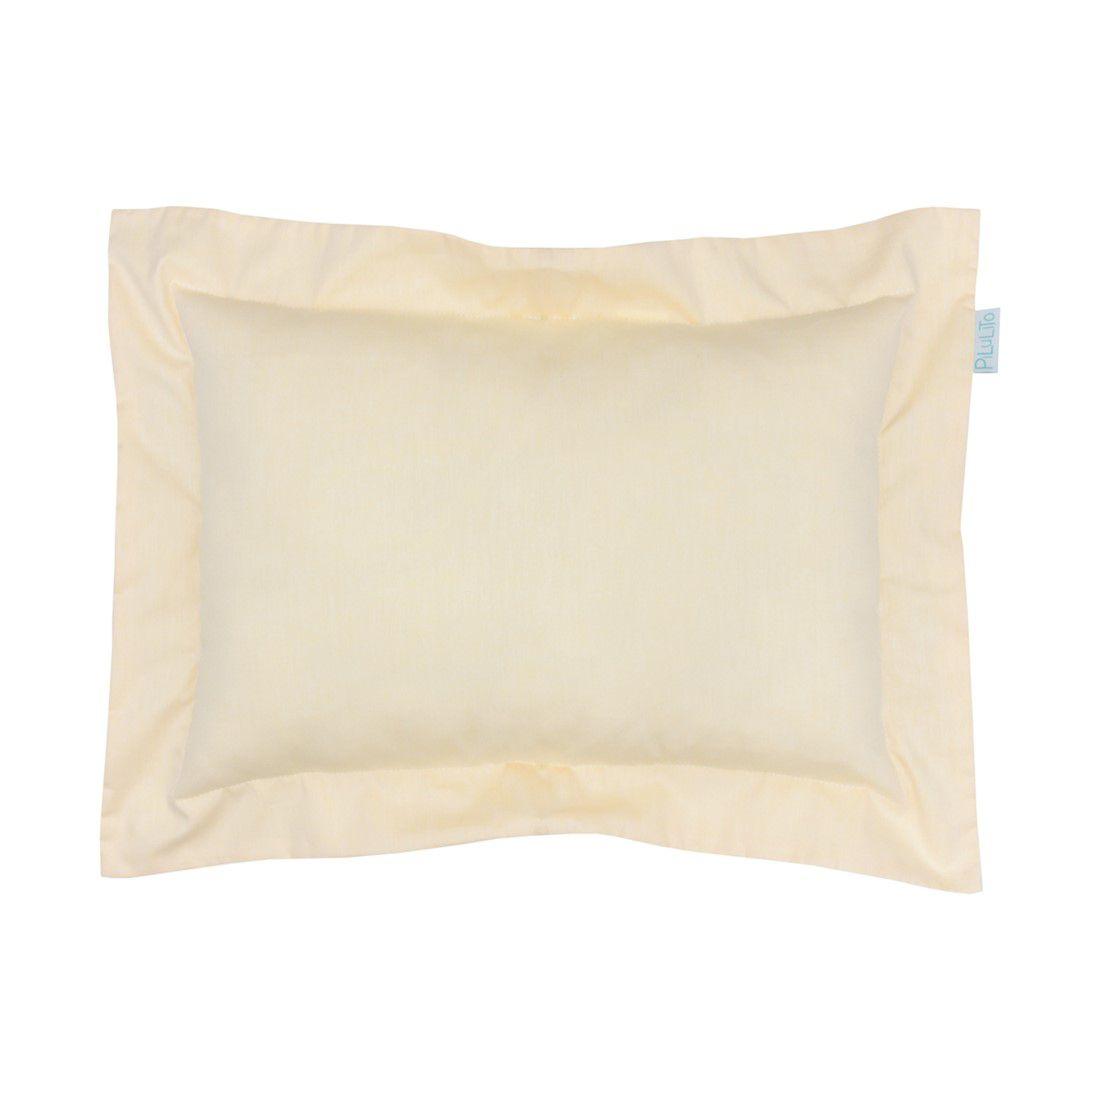 Capa de almofada 45x30cm amarelo suave